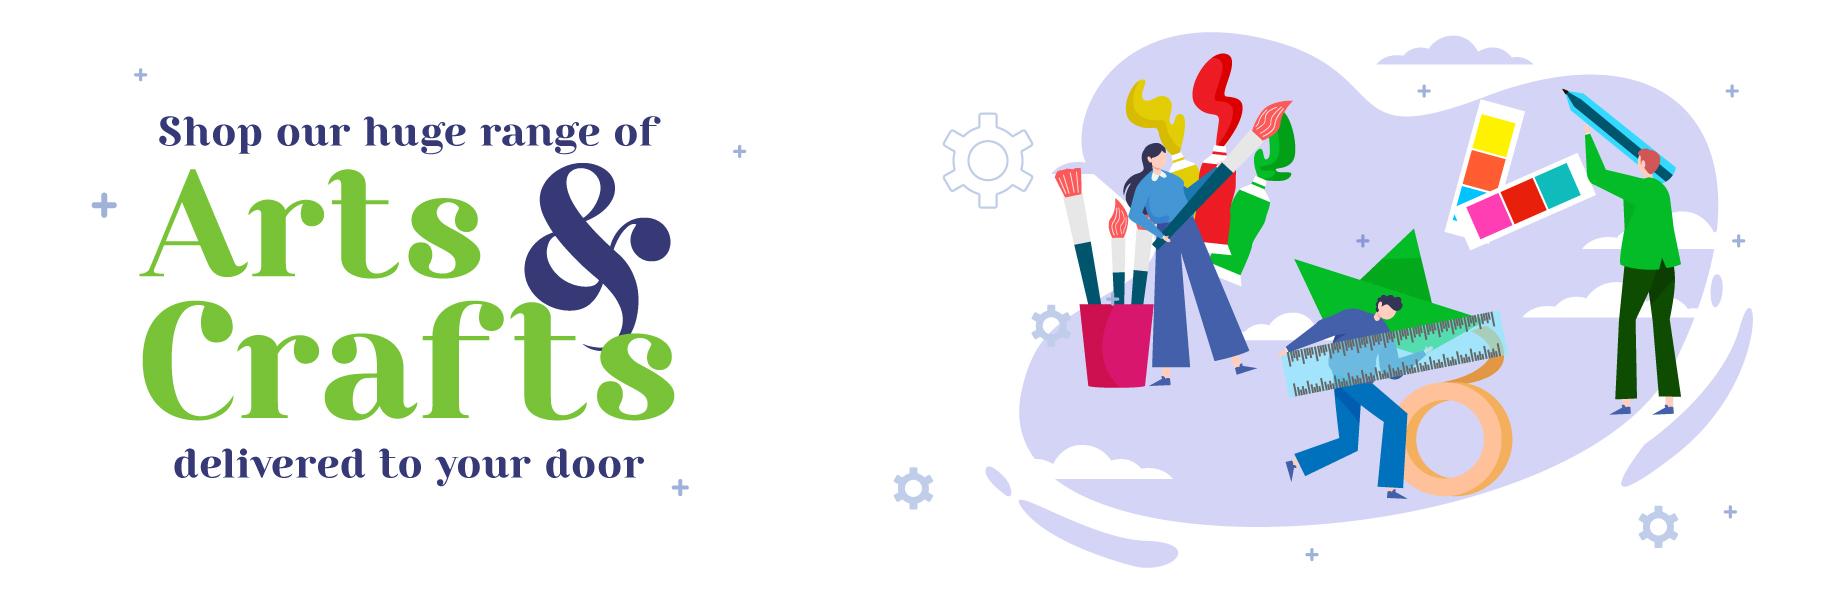 Arts & Crafts | Writeaway.ie online arts and crafts delivered Ireland